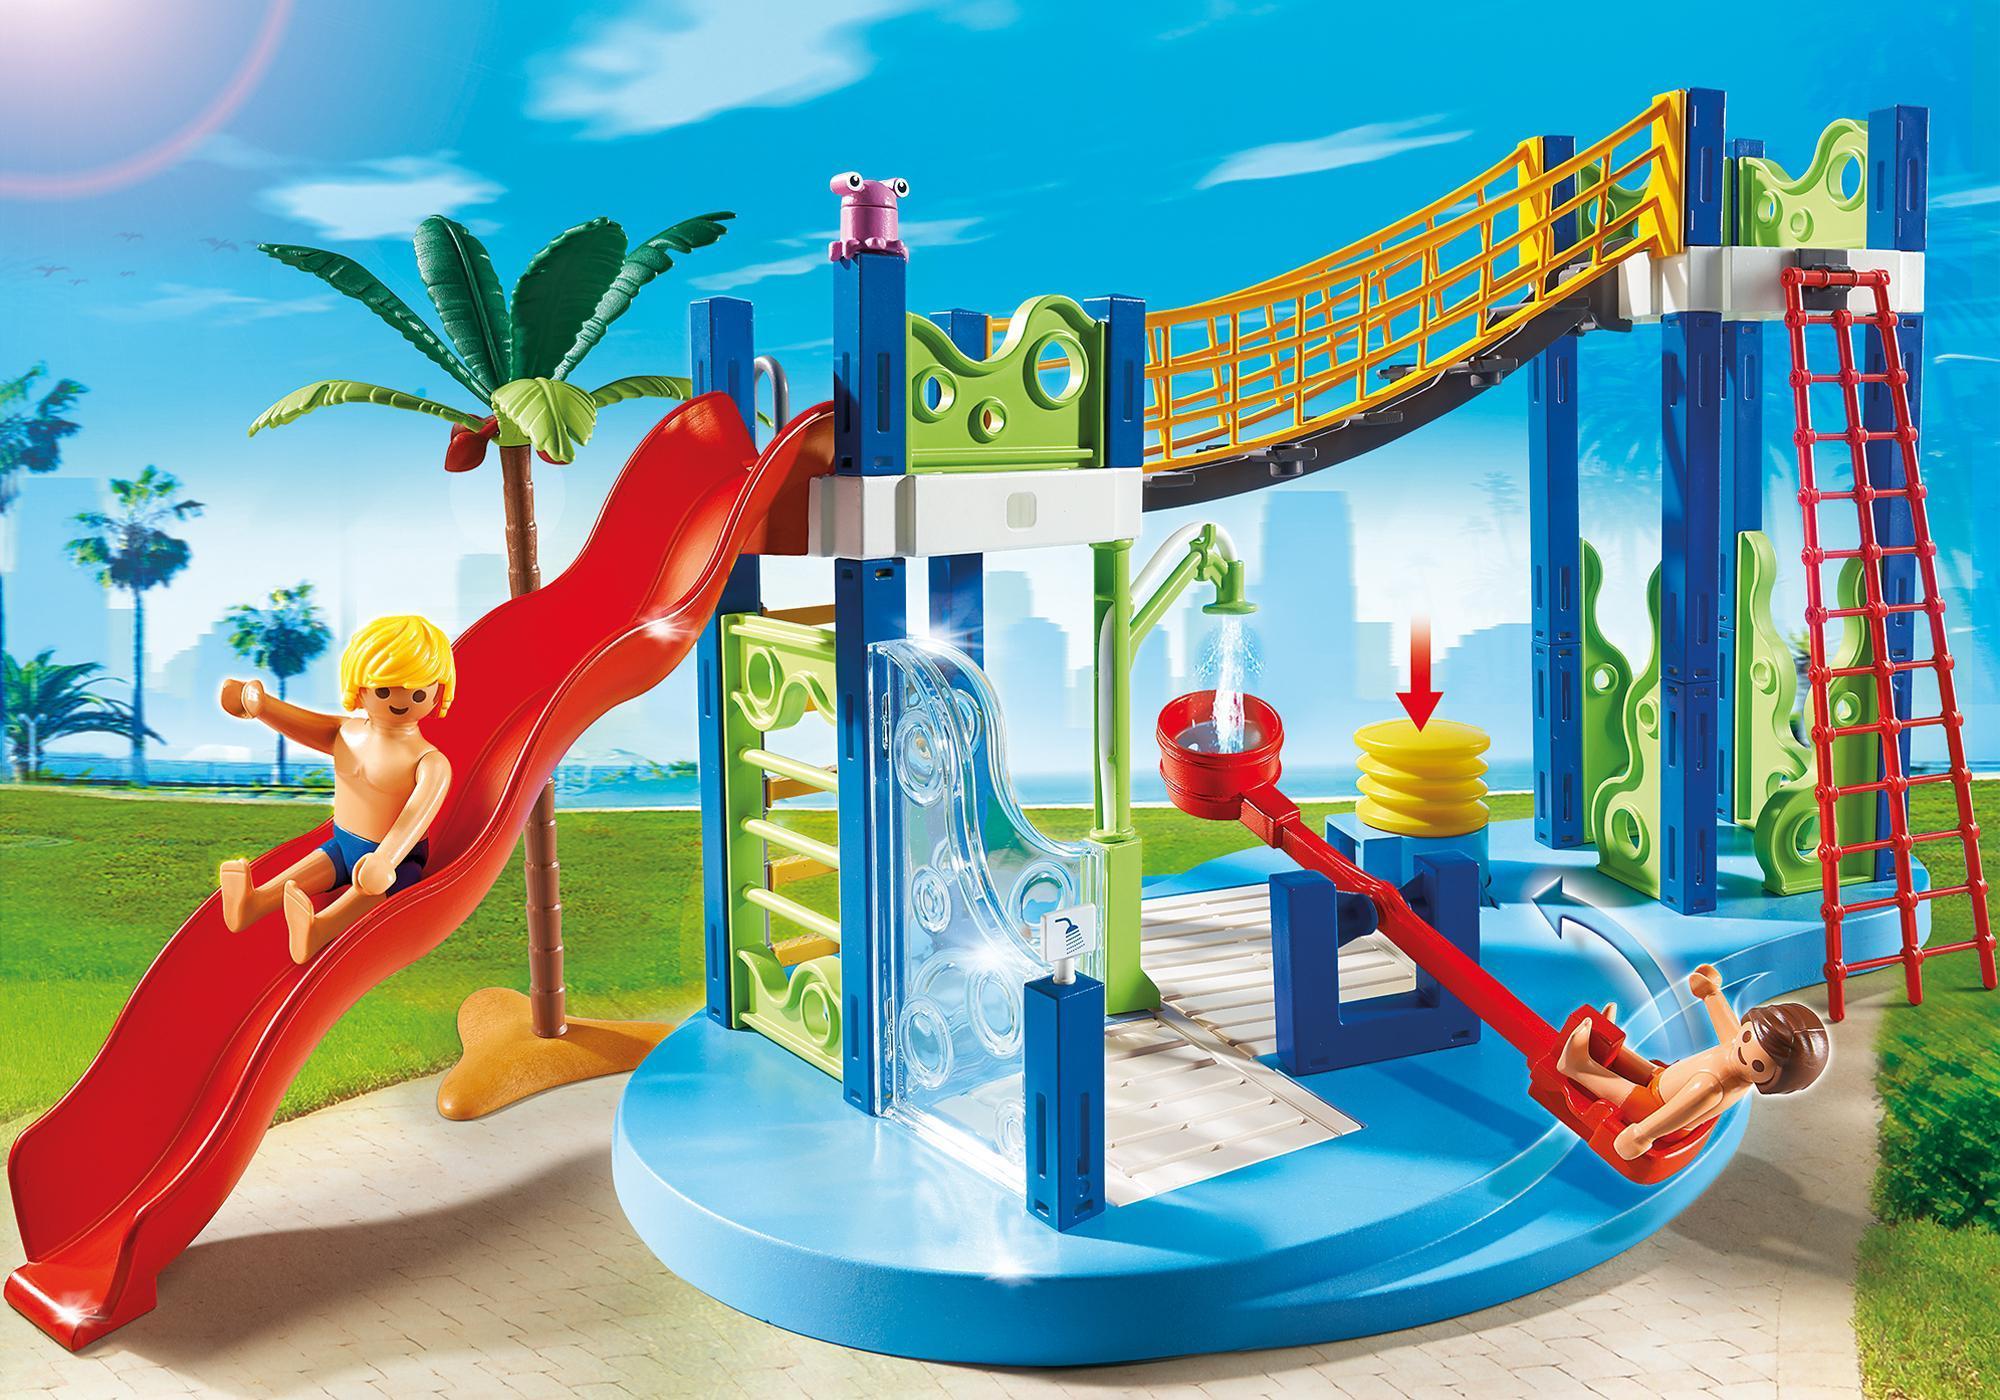 6670_product_detail/Παιδότοπος Aqua Park